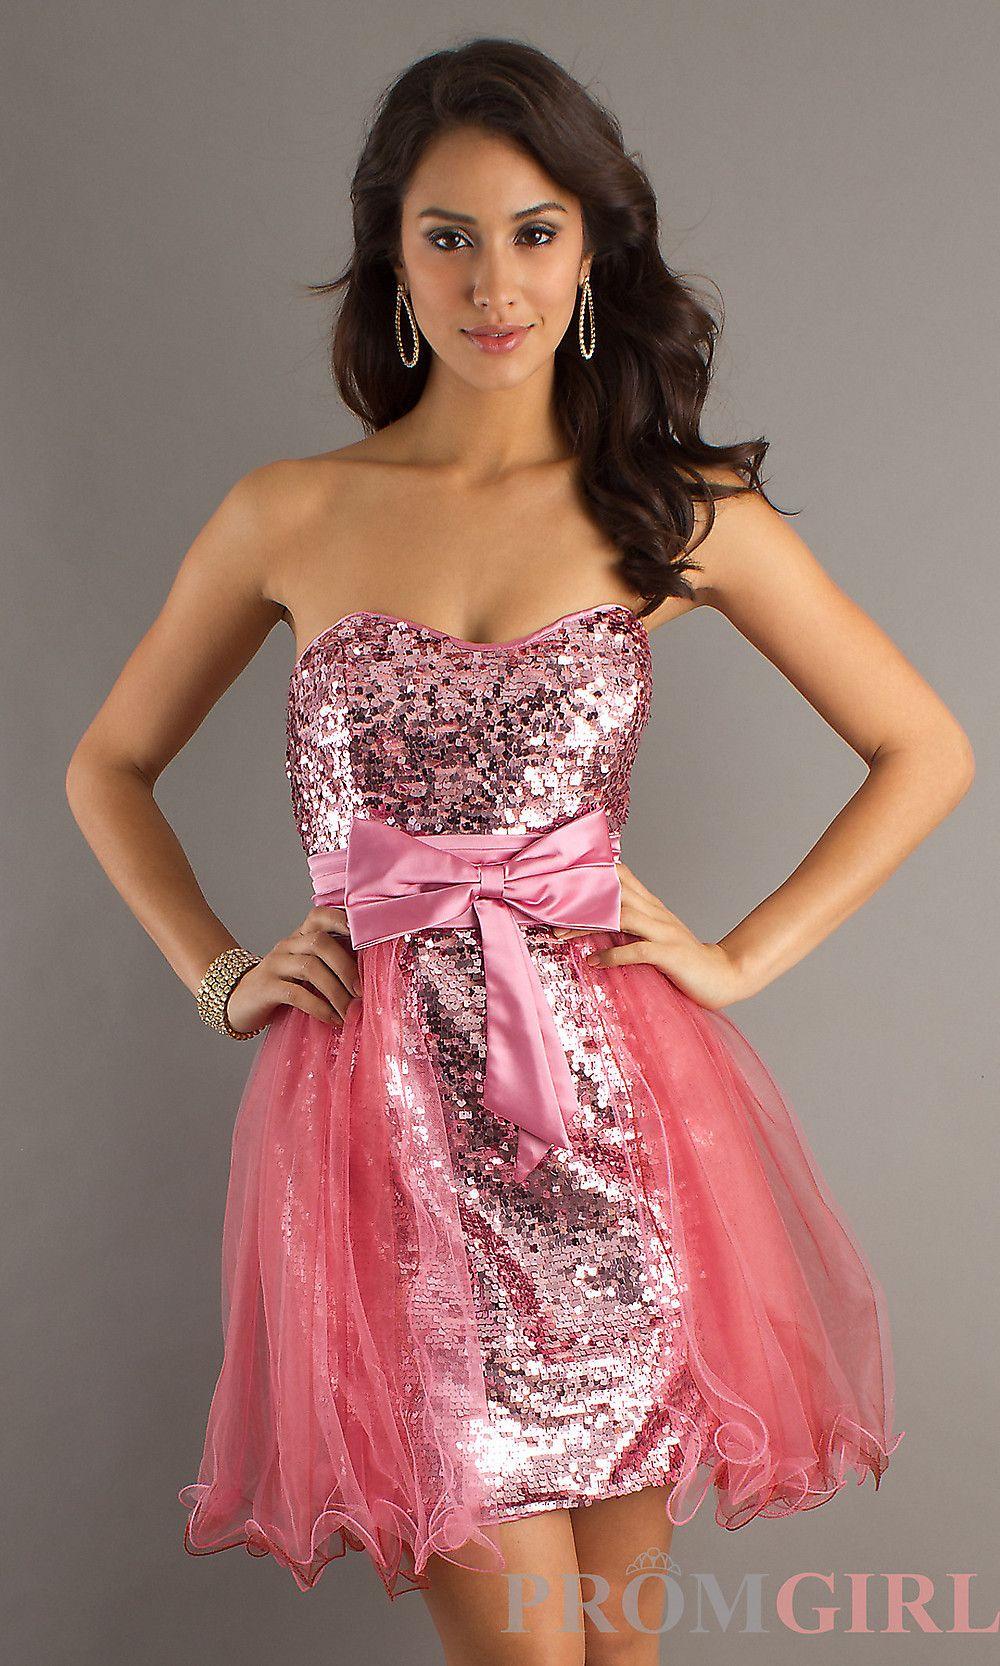 View Dress Detail: DJ-7269 | Performance dresses | Pinterest ...